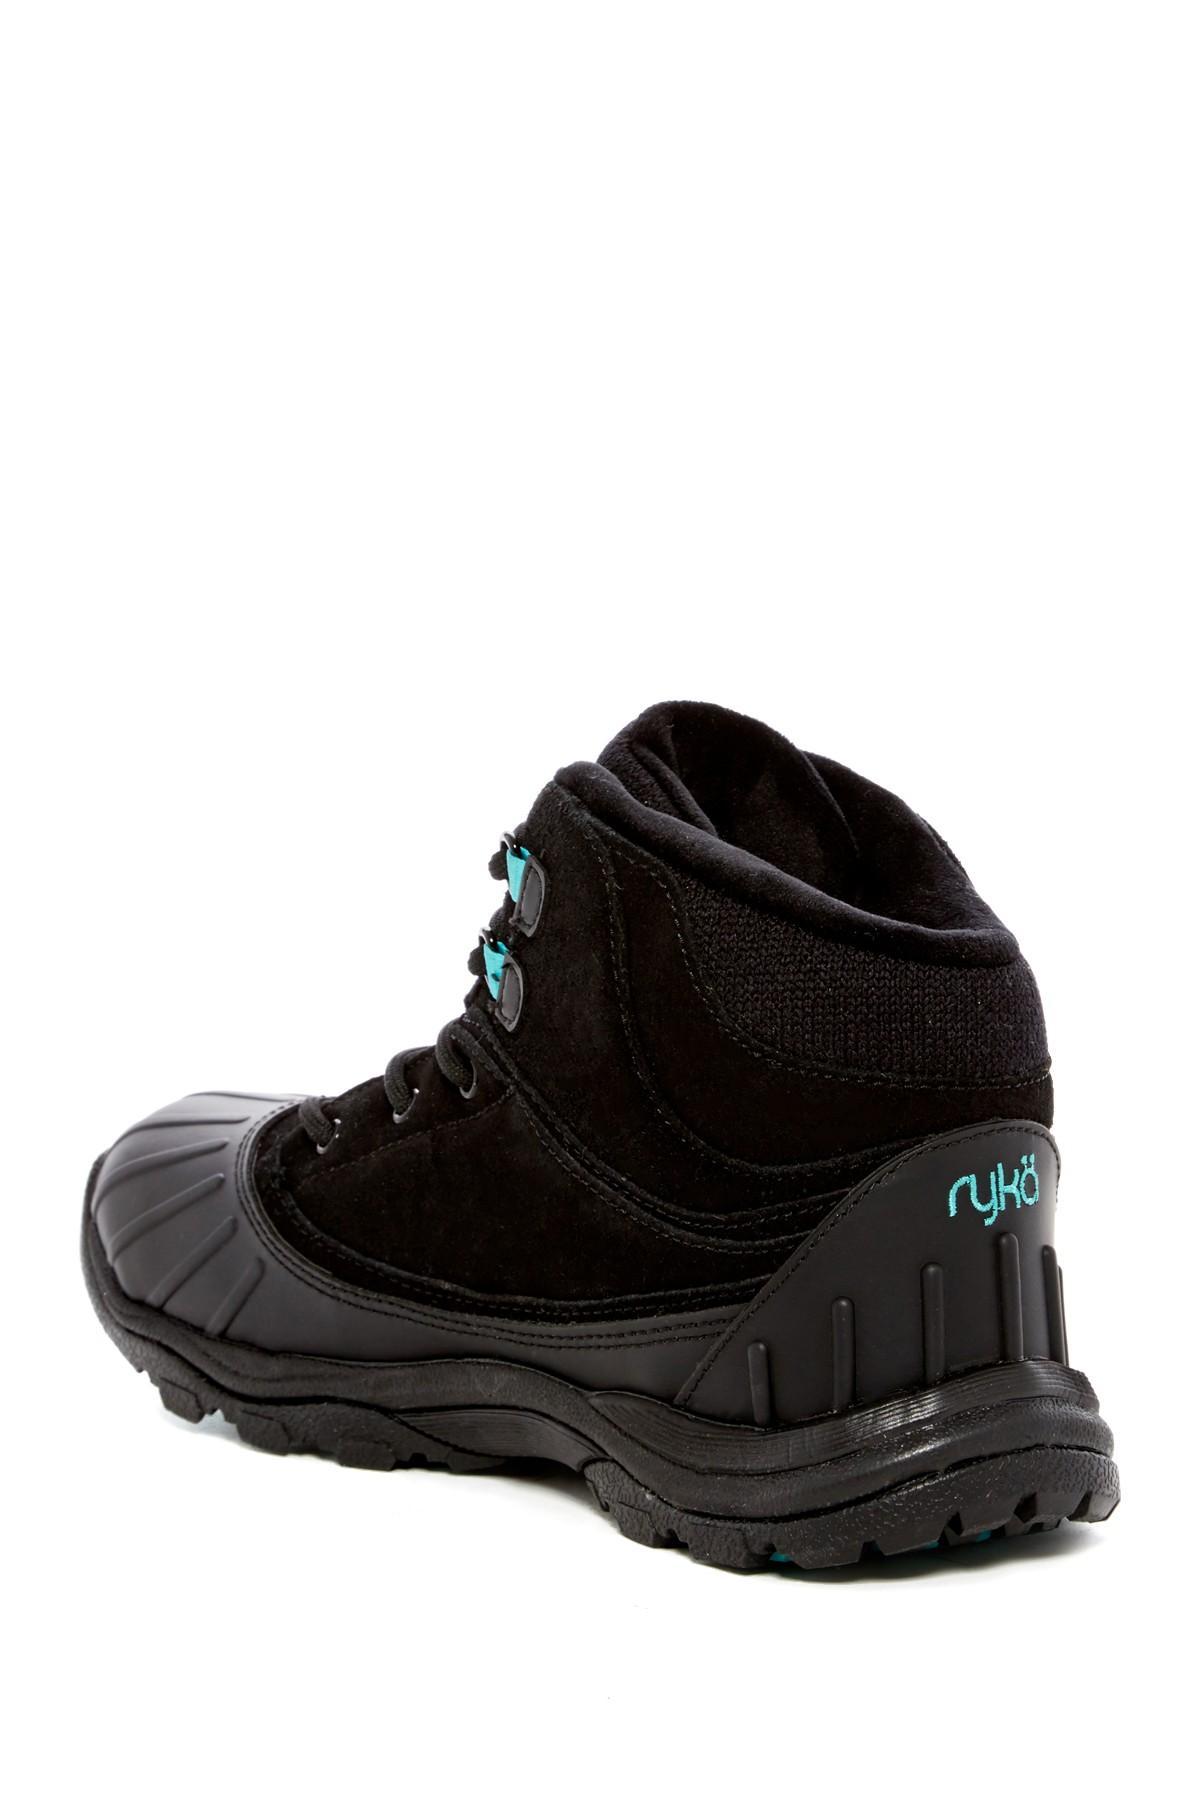 Ryka Black Suede Shoes